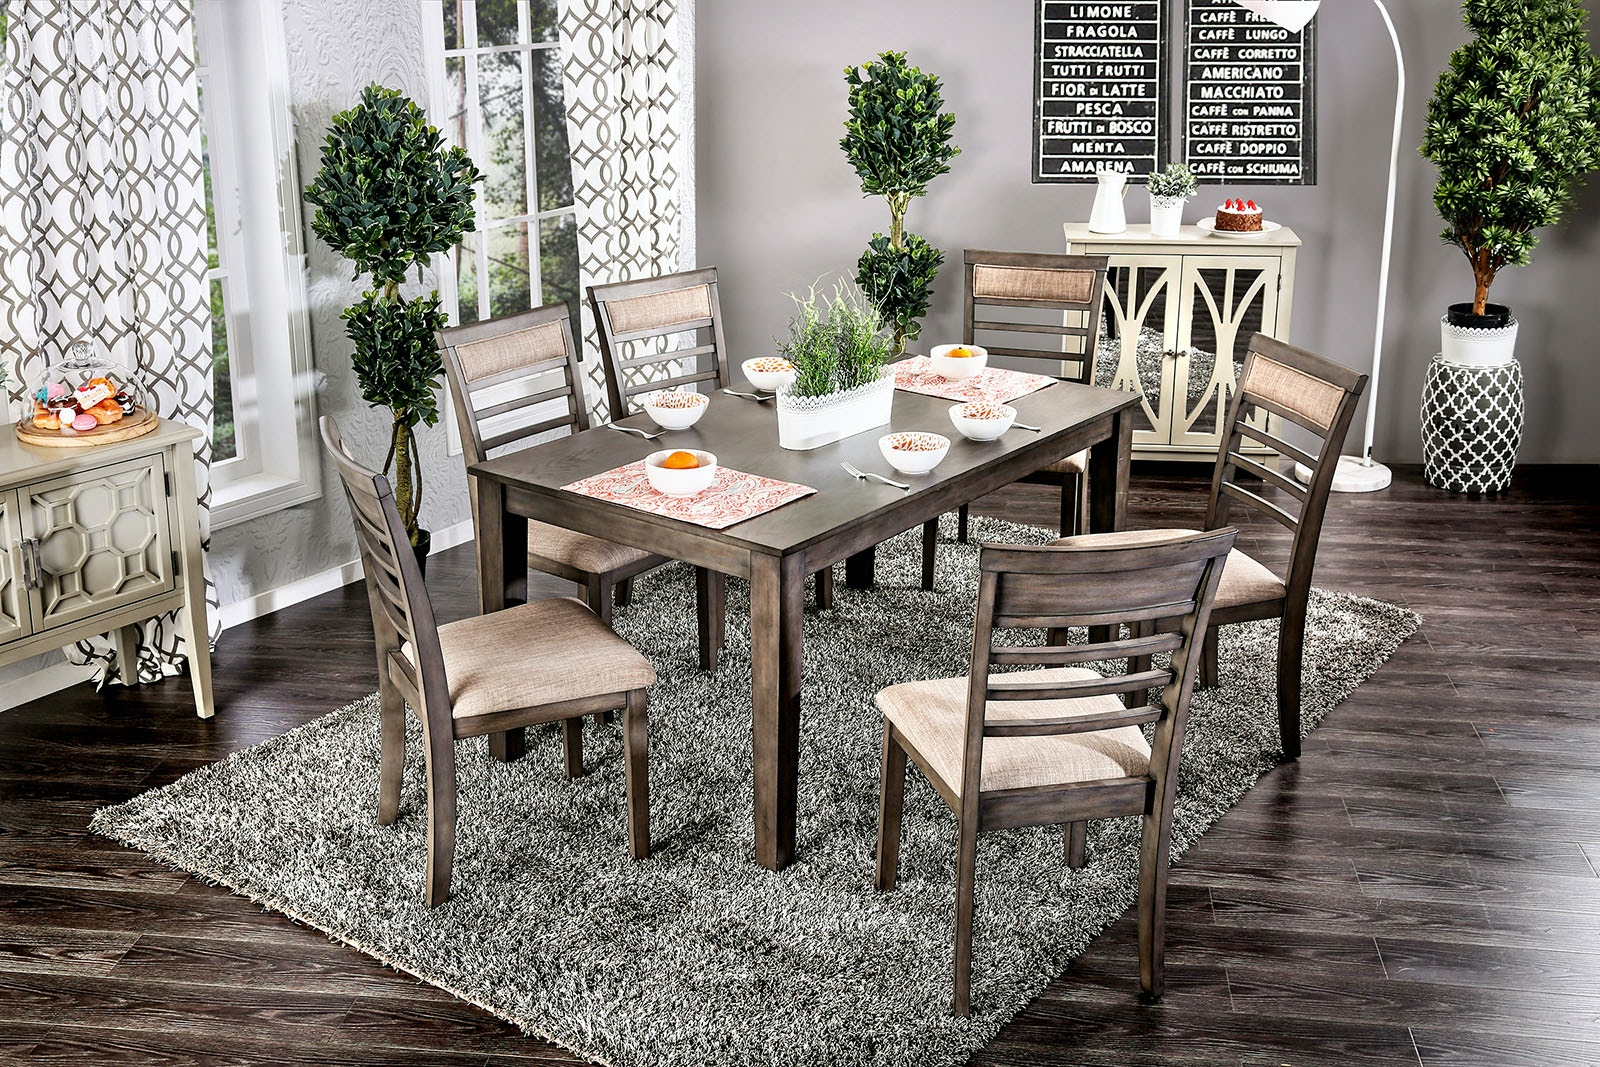 Furniture of America 7 Pc. Dining Table Set CM3607T-7PK & Furniture of America Dining Room 7 Pc. Dining Table Set CM3607T-7PK ...